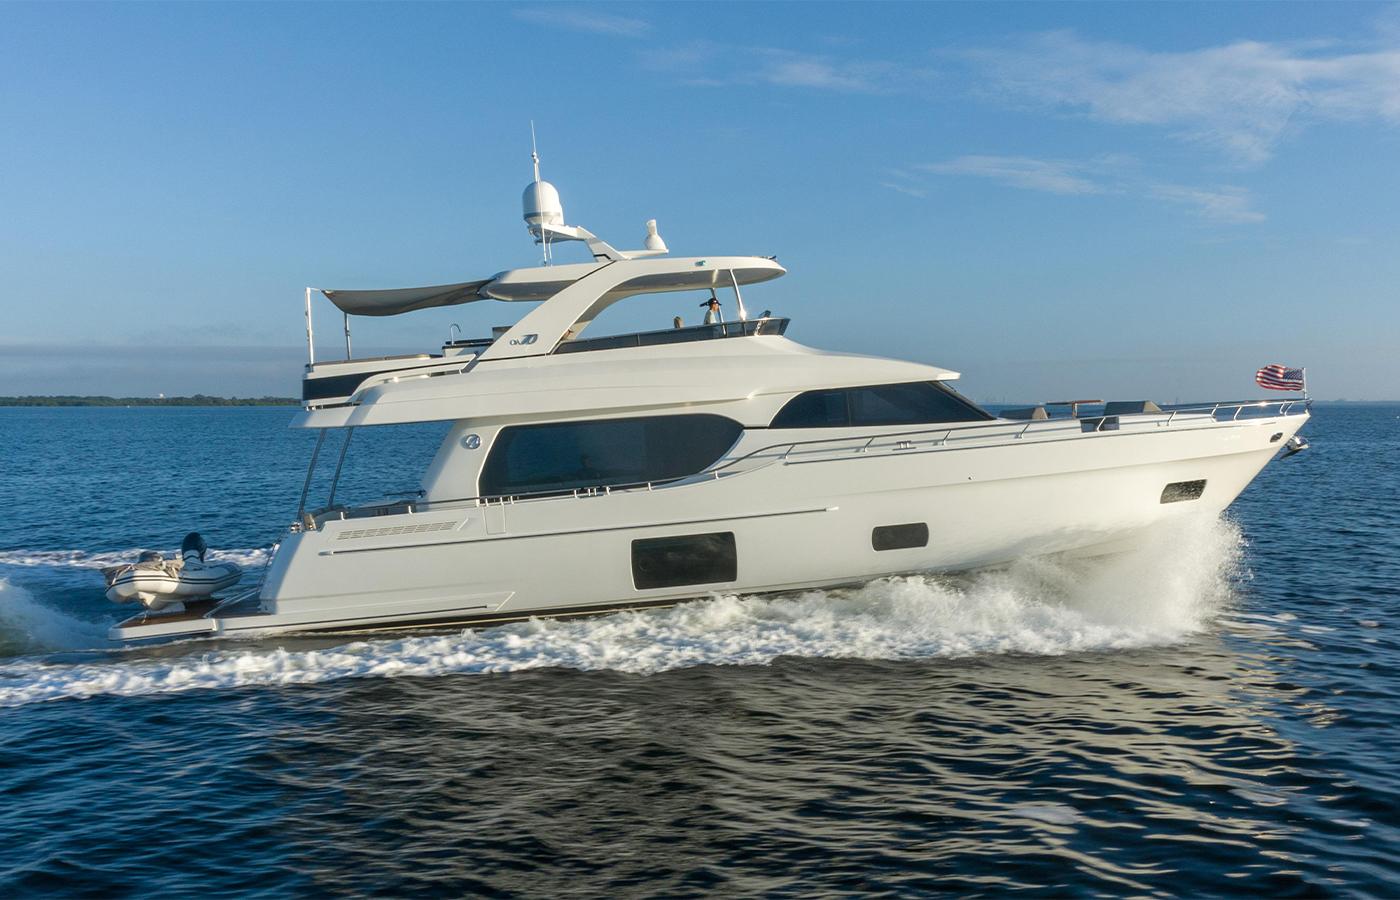 70 Ocean Alexander Motor Yacht Highlight [Boat Review + Video]